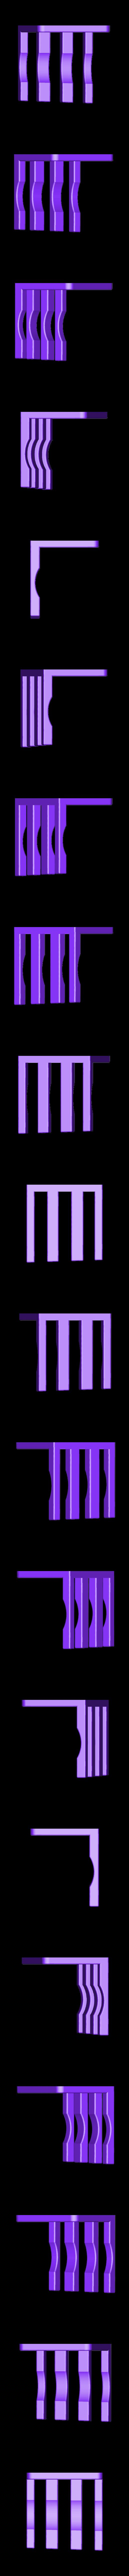 Part_3.stl Download free STL file XXL Combination Spanner Set 26pcs metric 6-32 mm Wall Holder 016 I for screws or peg board • 3D printable model, Wiesemann1893